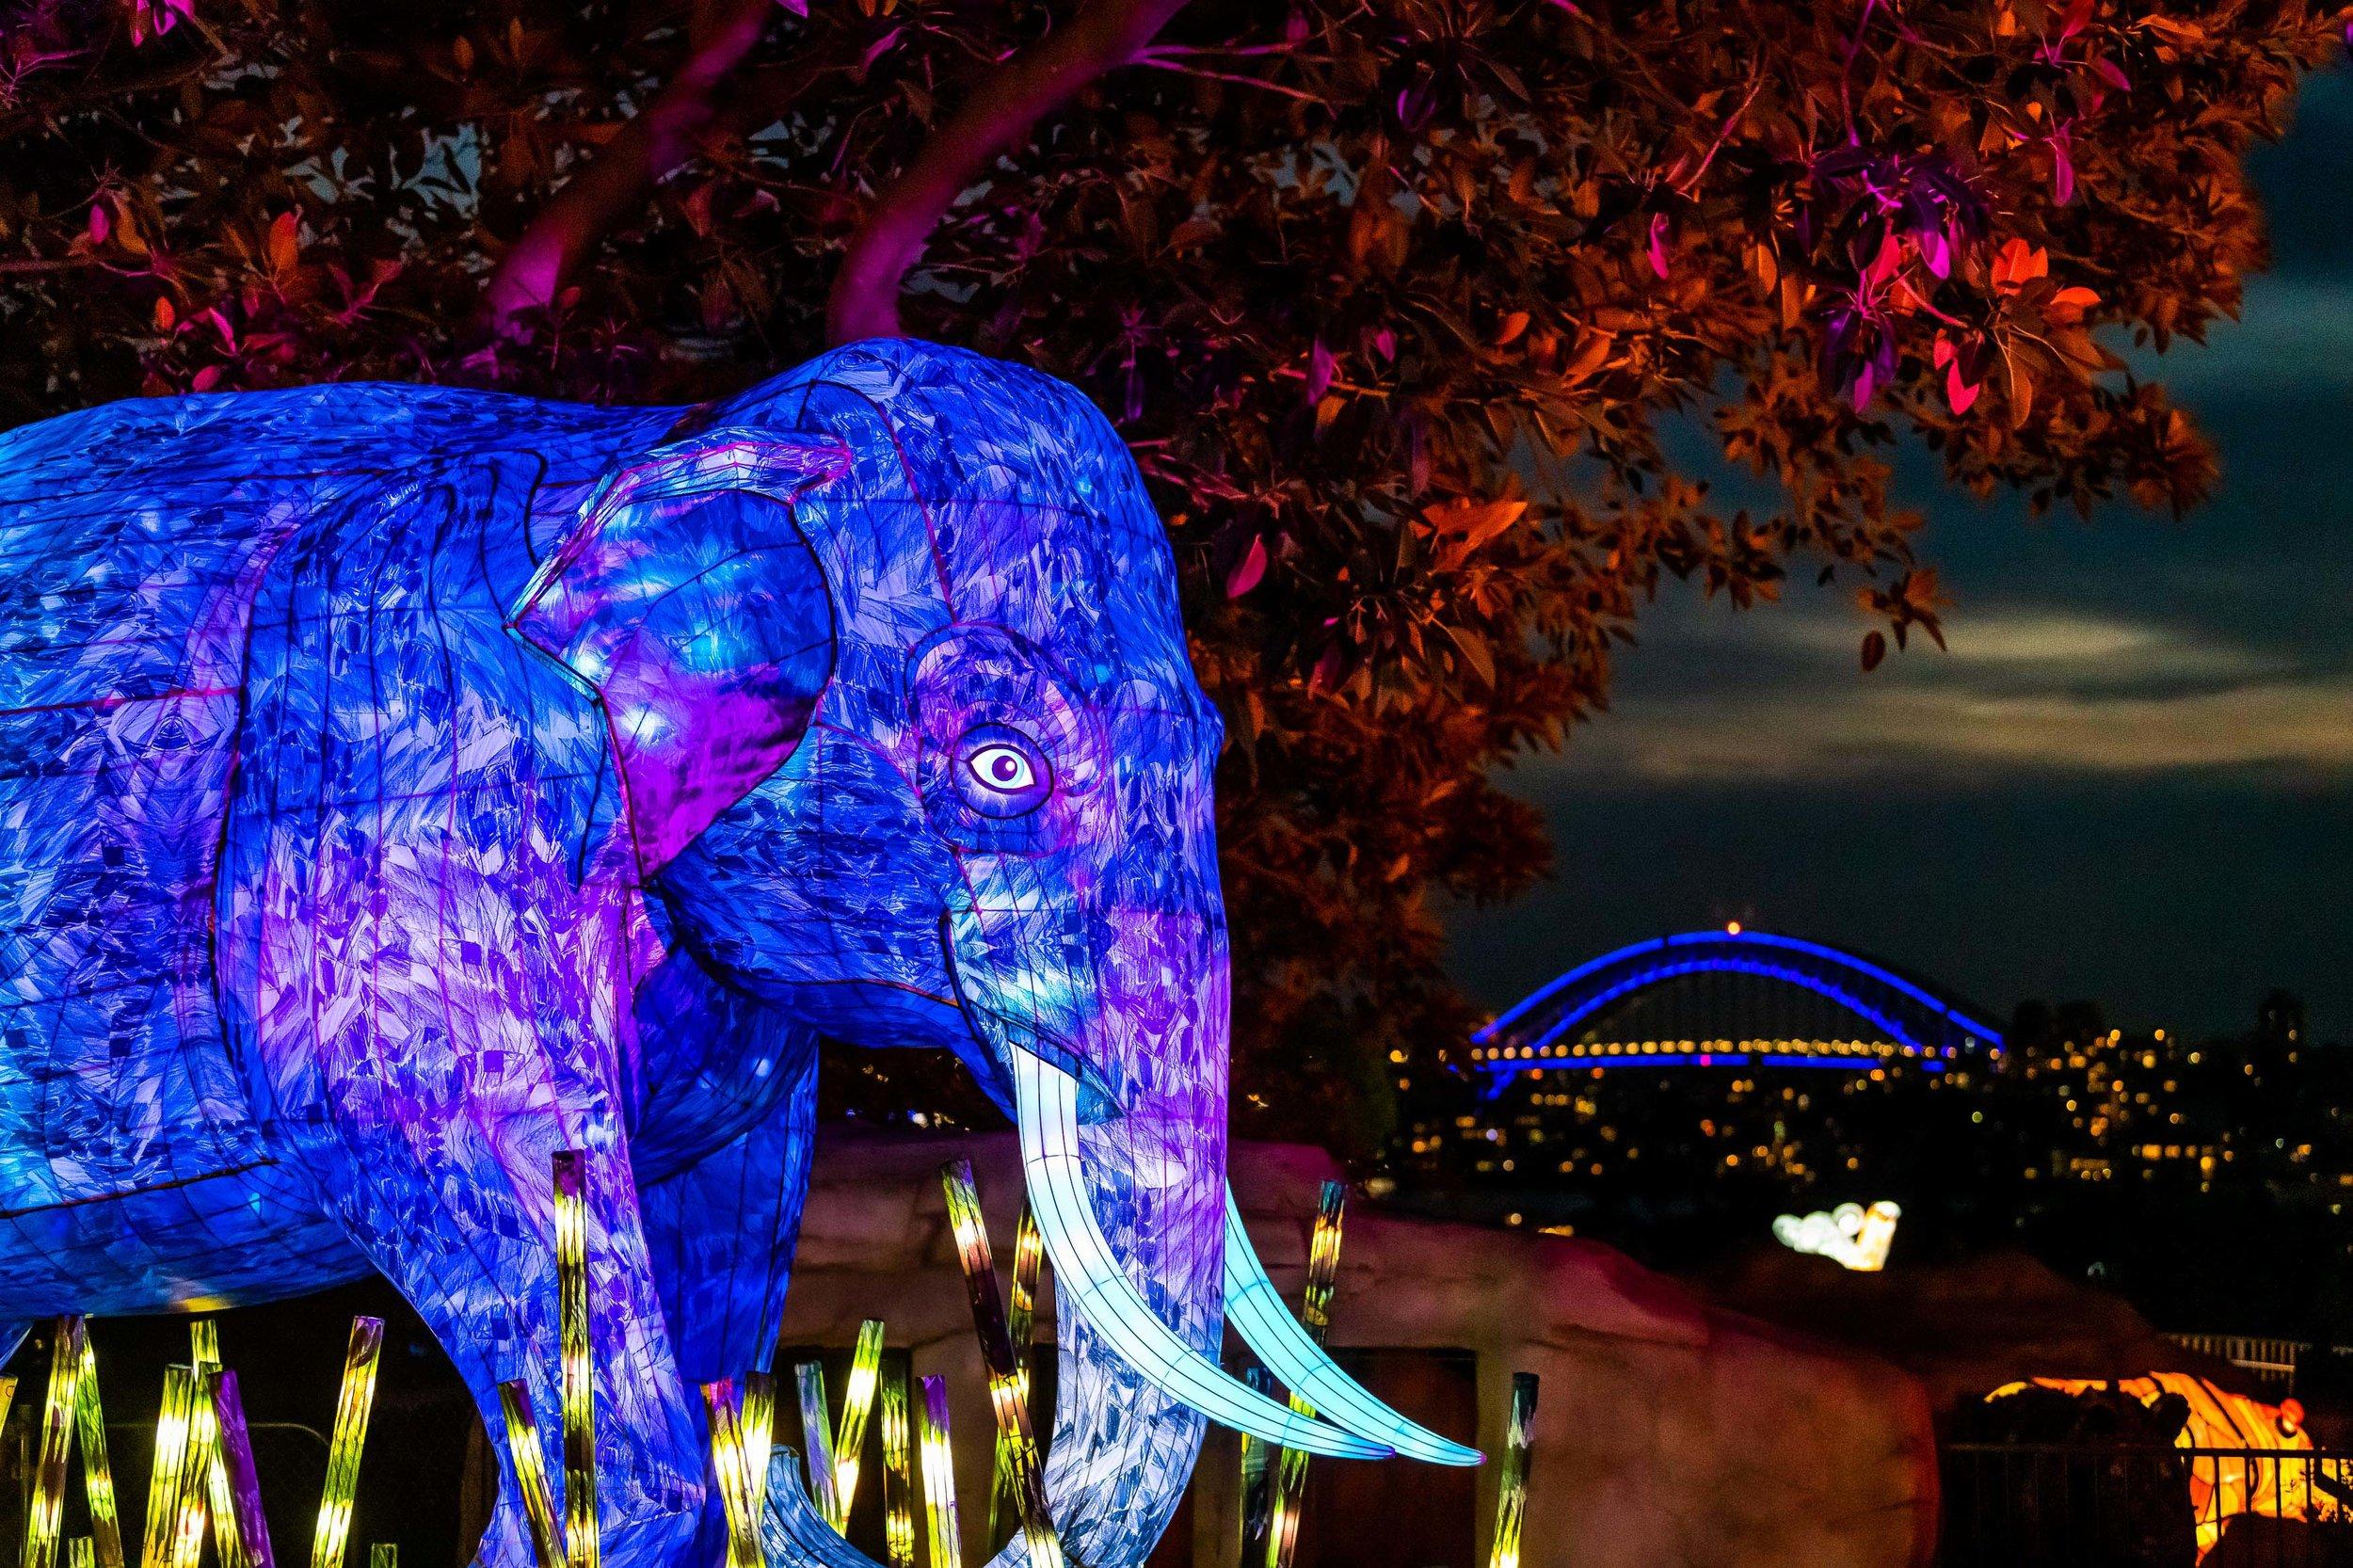 VividSydney2019_TarongaZoo_Elephant_CreditDestinationNSW_KM-1798.jpg